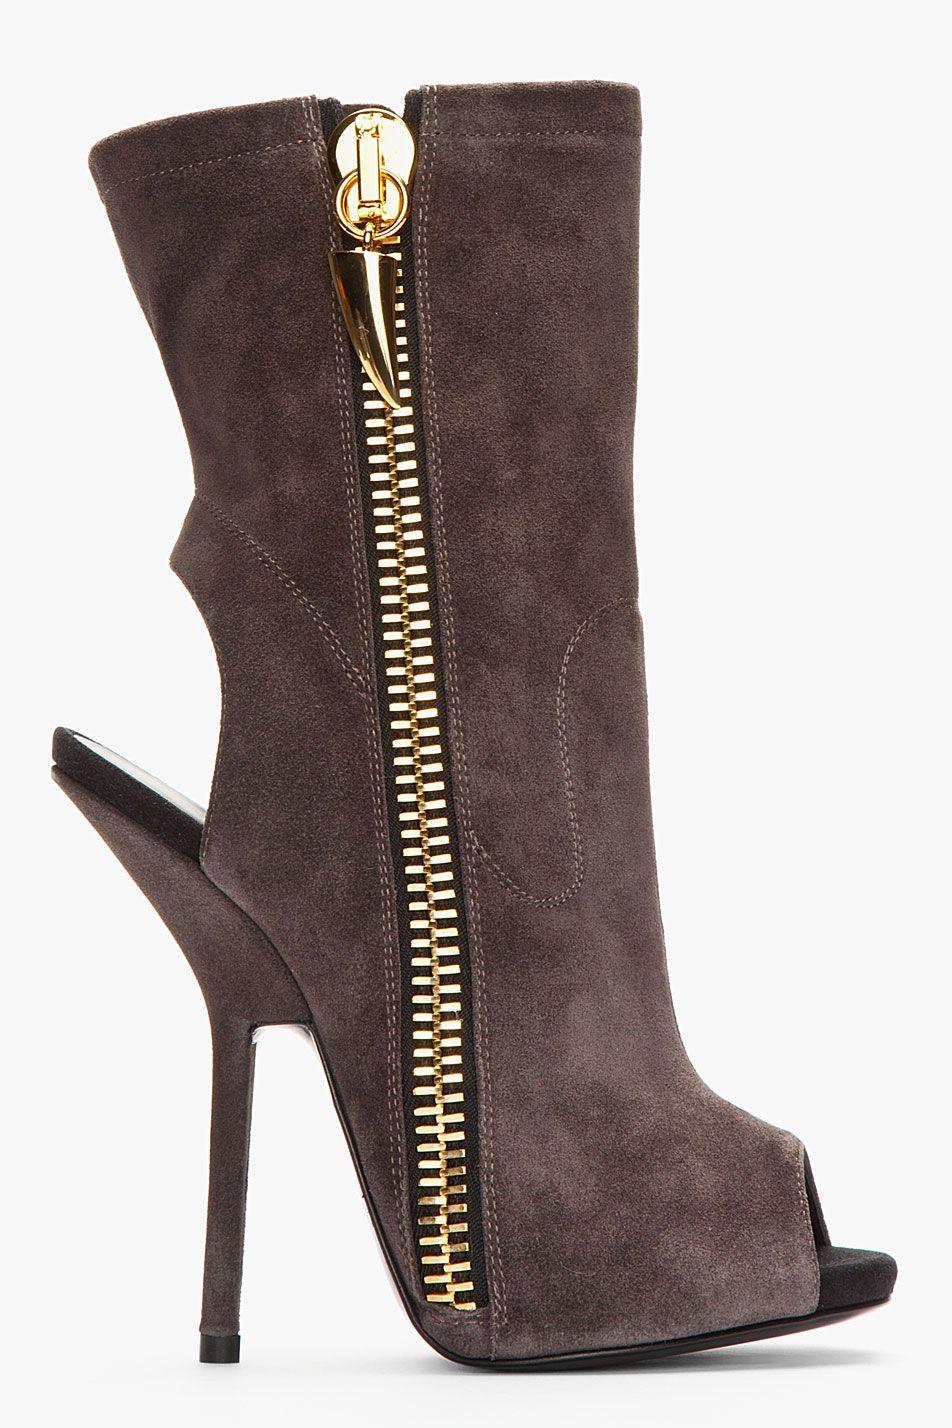 Chaussures - Bottines Giuseppe Zanotti 4kBq6Yyl